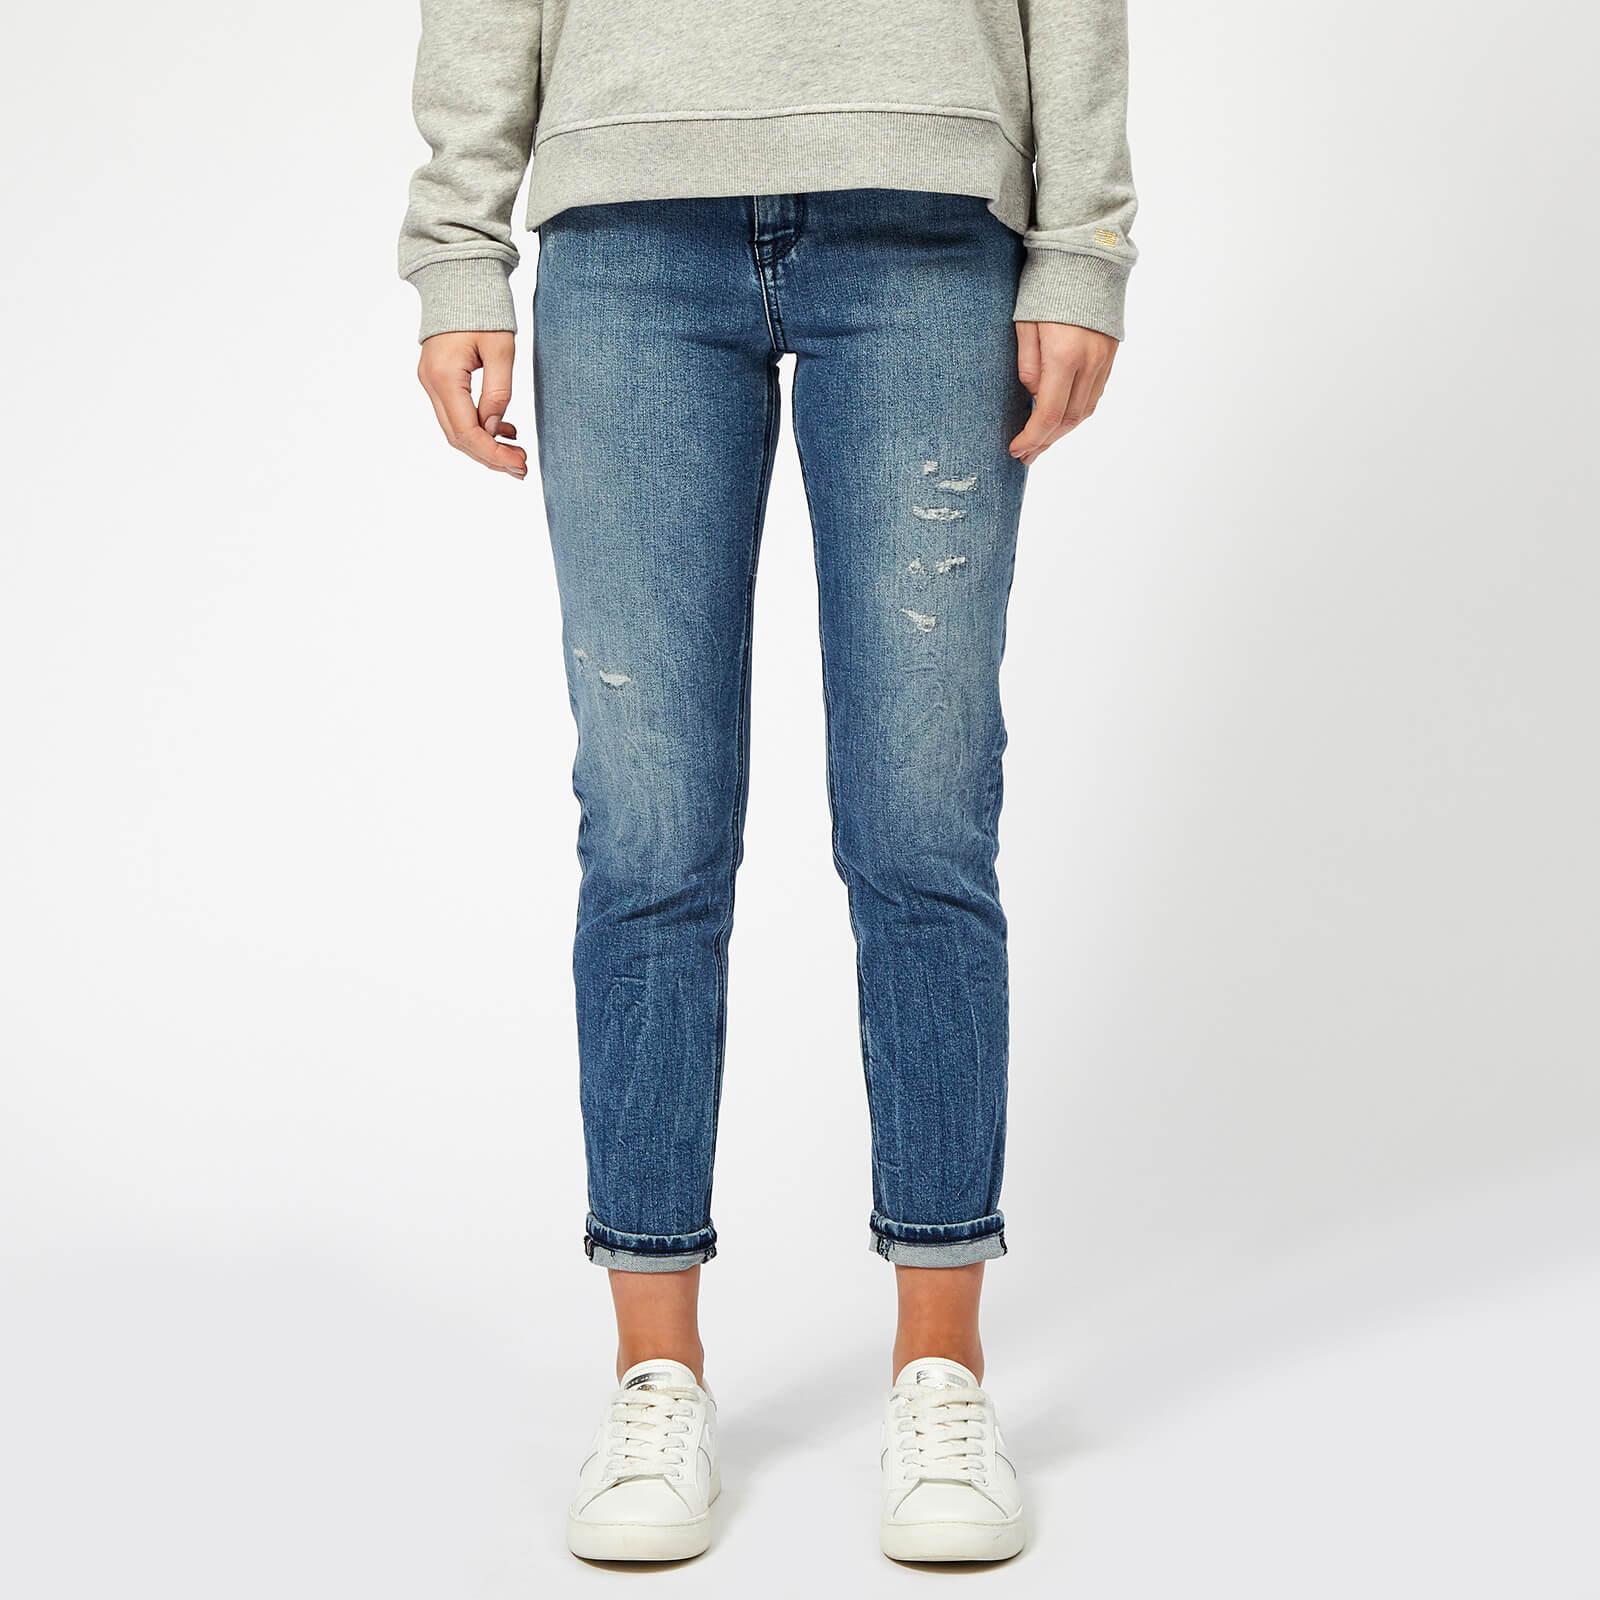 05b9d7386 Tommy Hilfiger Women's Icons Gramercy Jeans - Blue Clothing | TheHut.com